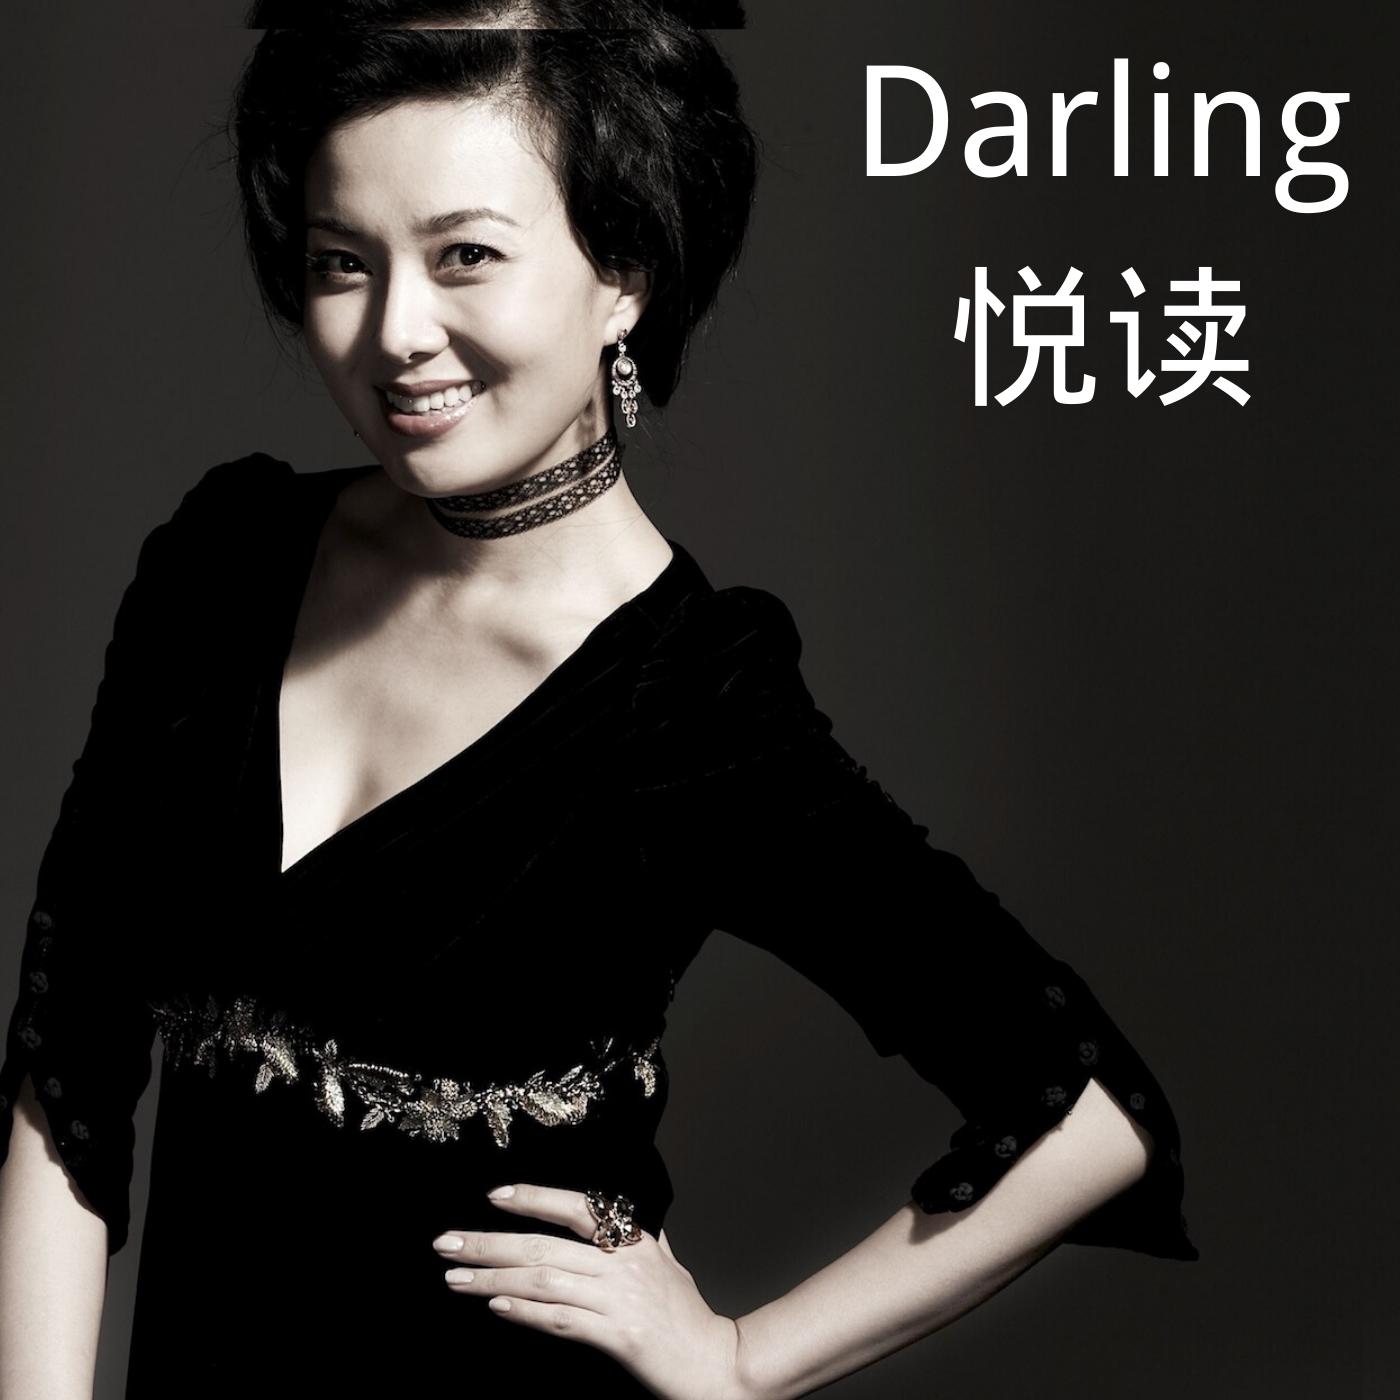 Darling悦读